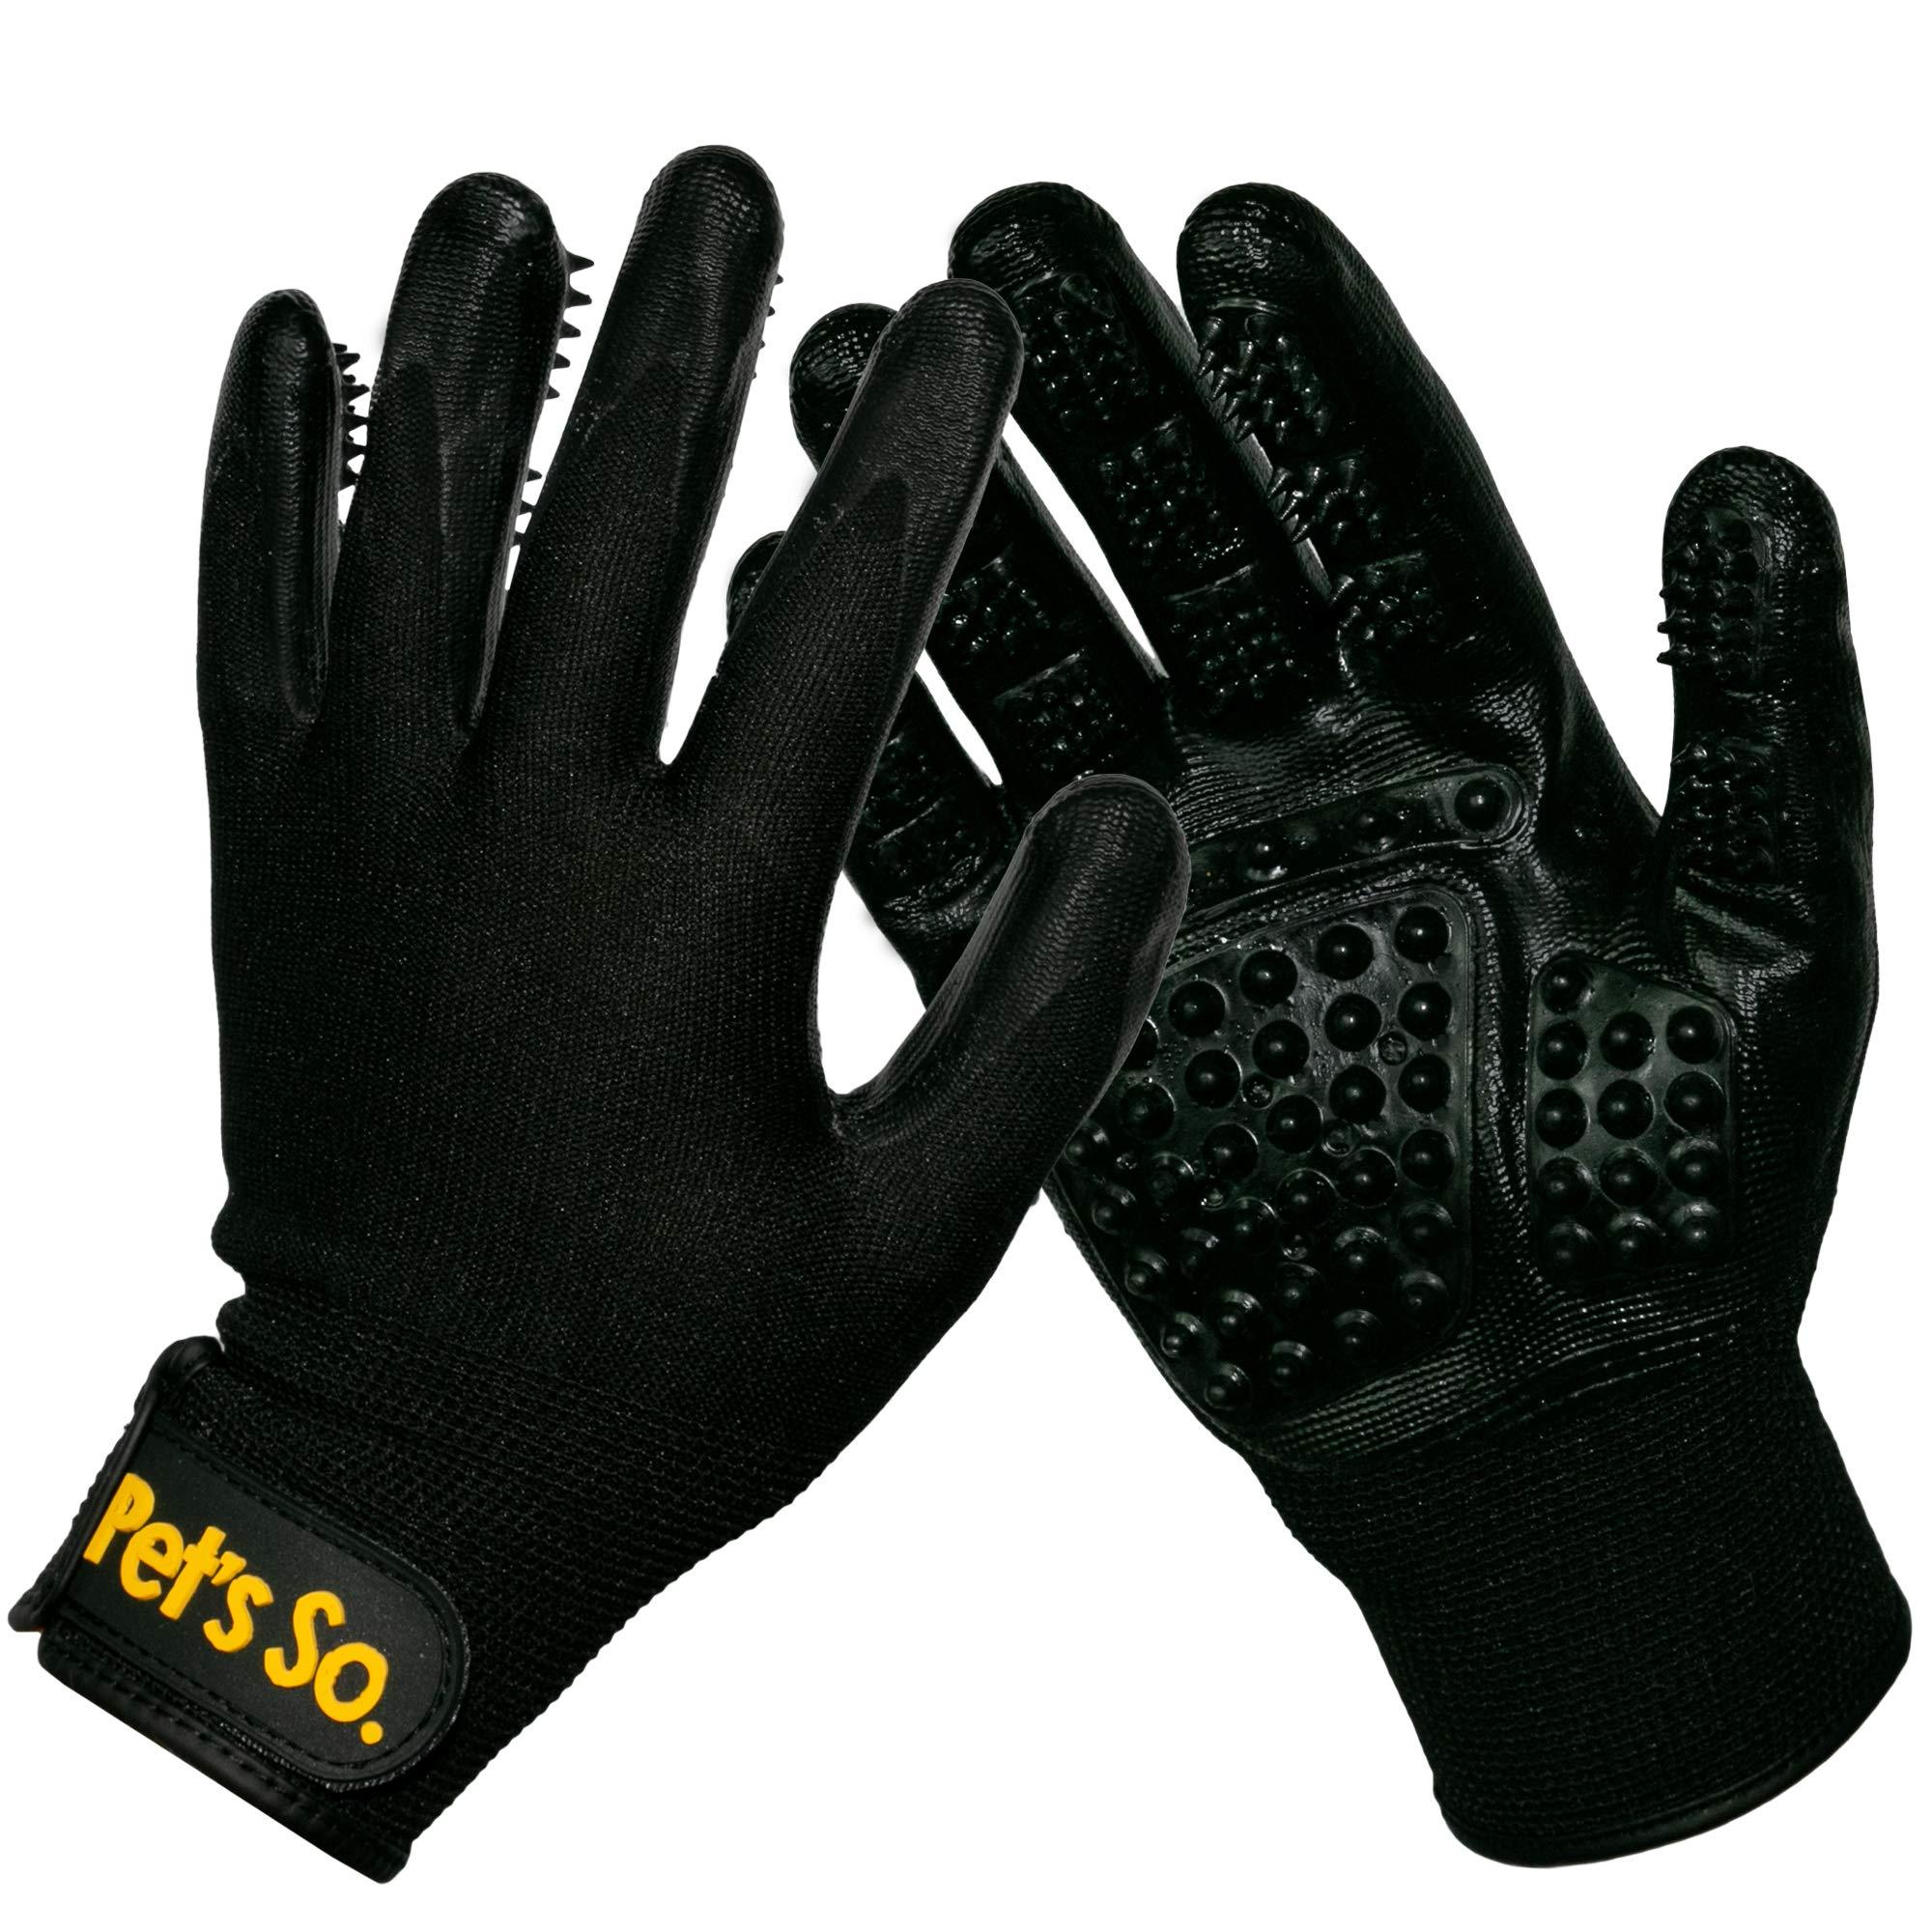 PetsSo. Left & Right Pet Grooming Gloves|Enhanced Five Finger Design|Dog Brush|cat Brush|Horse Brush| Adjustable Wrist Strap|[Size: Medium] by PetsSo.